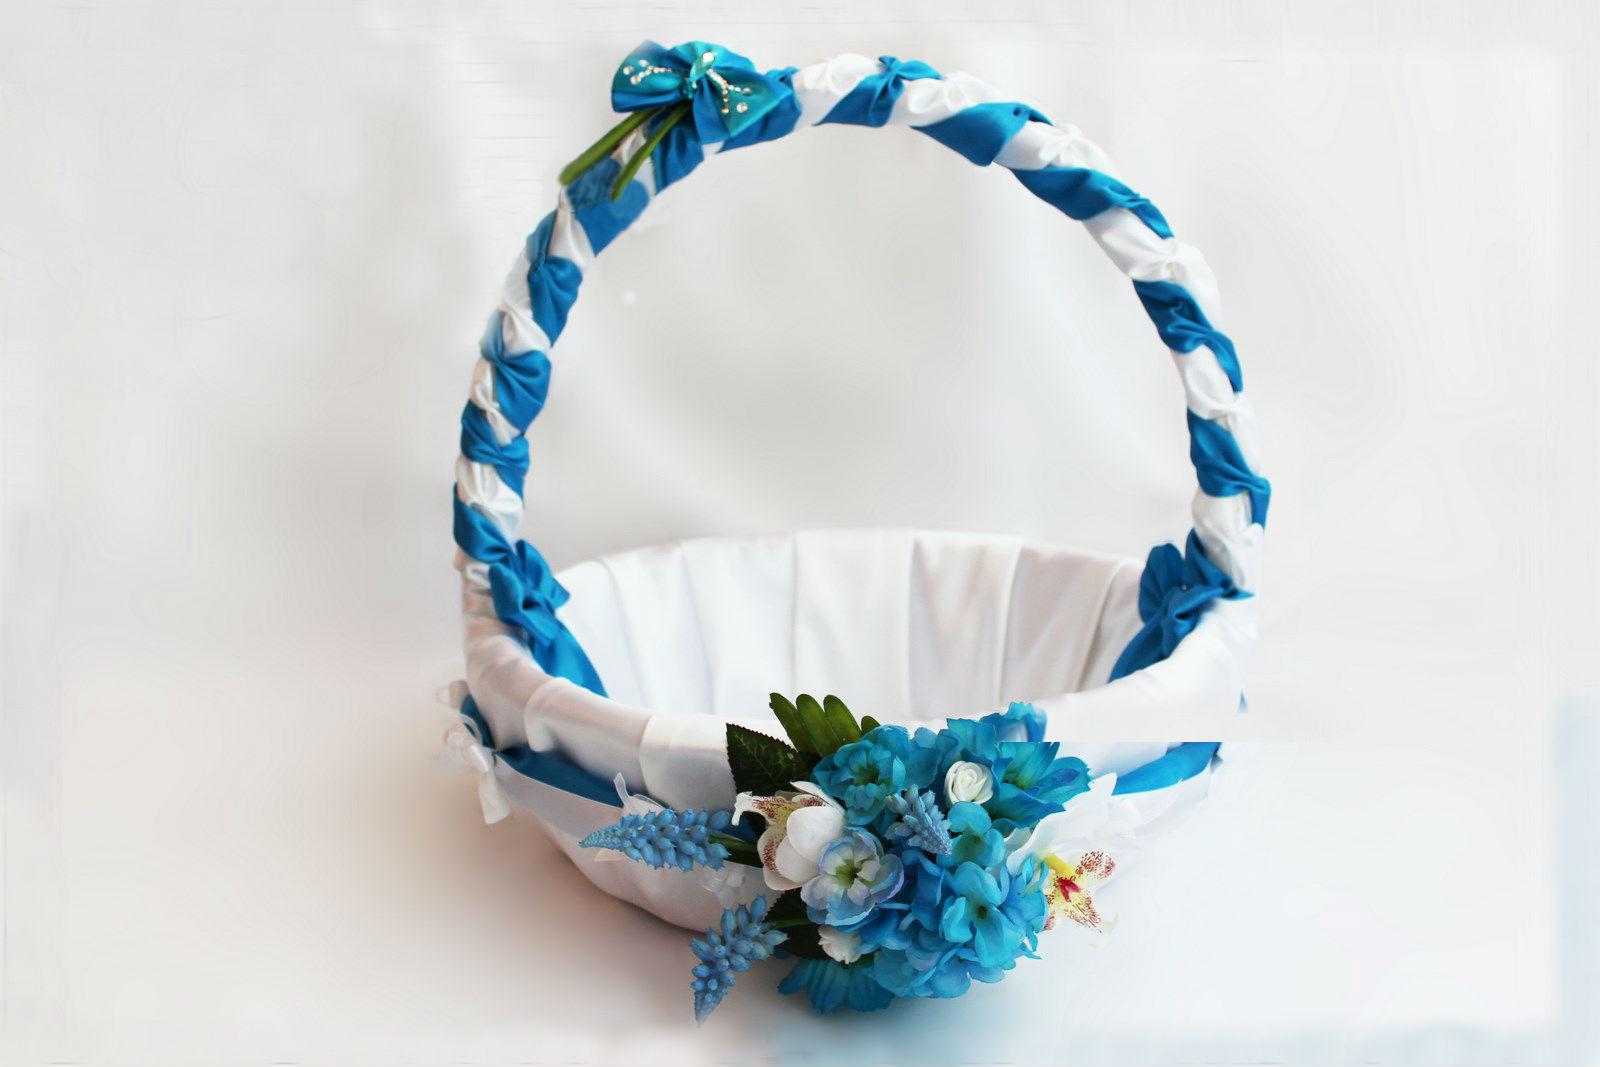 Подарки на свадьбу - купить Подарки на свадьбу 3